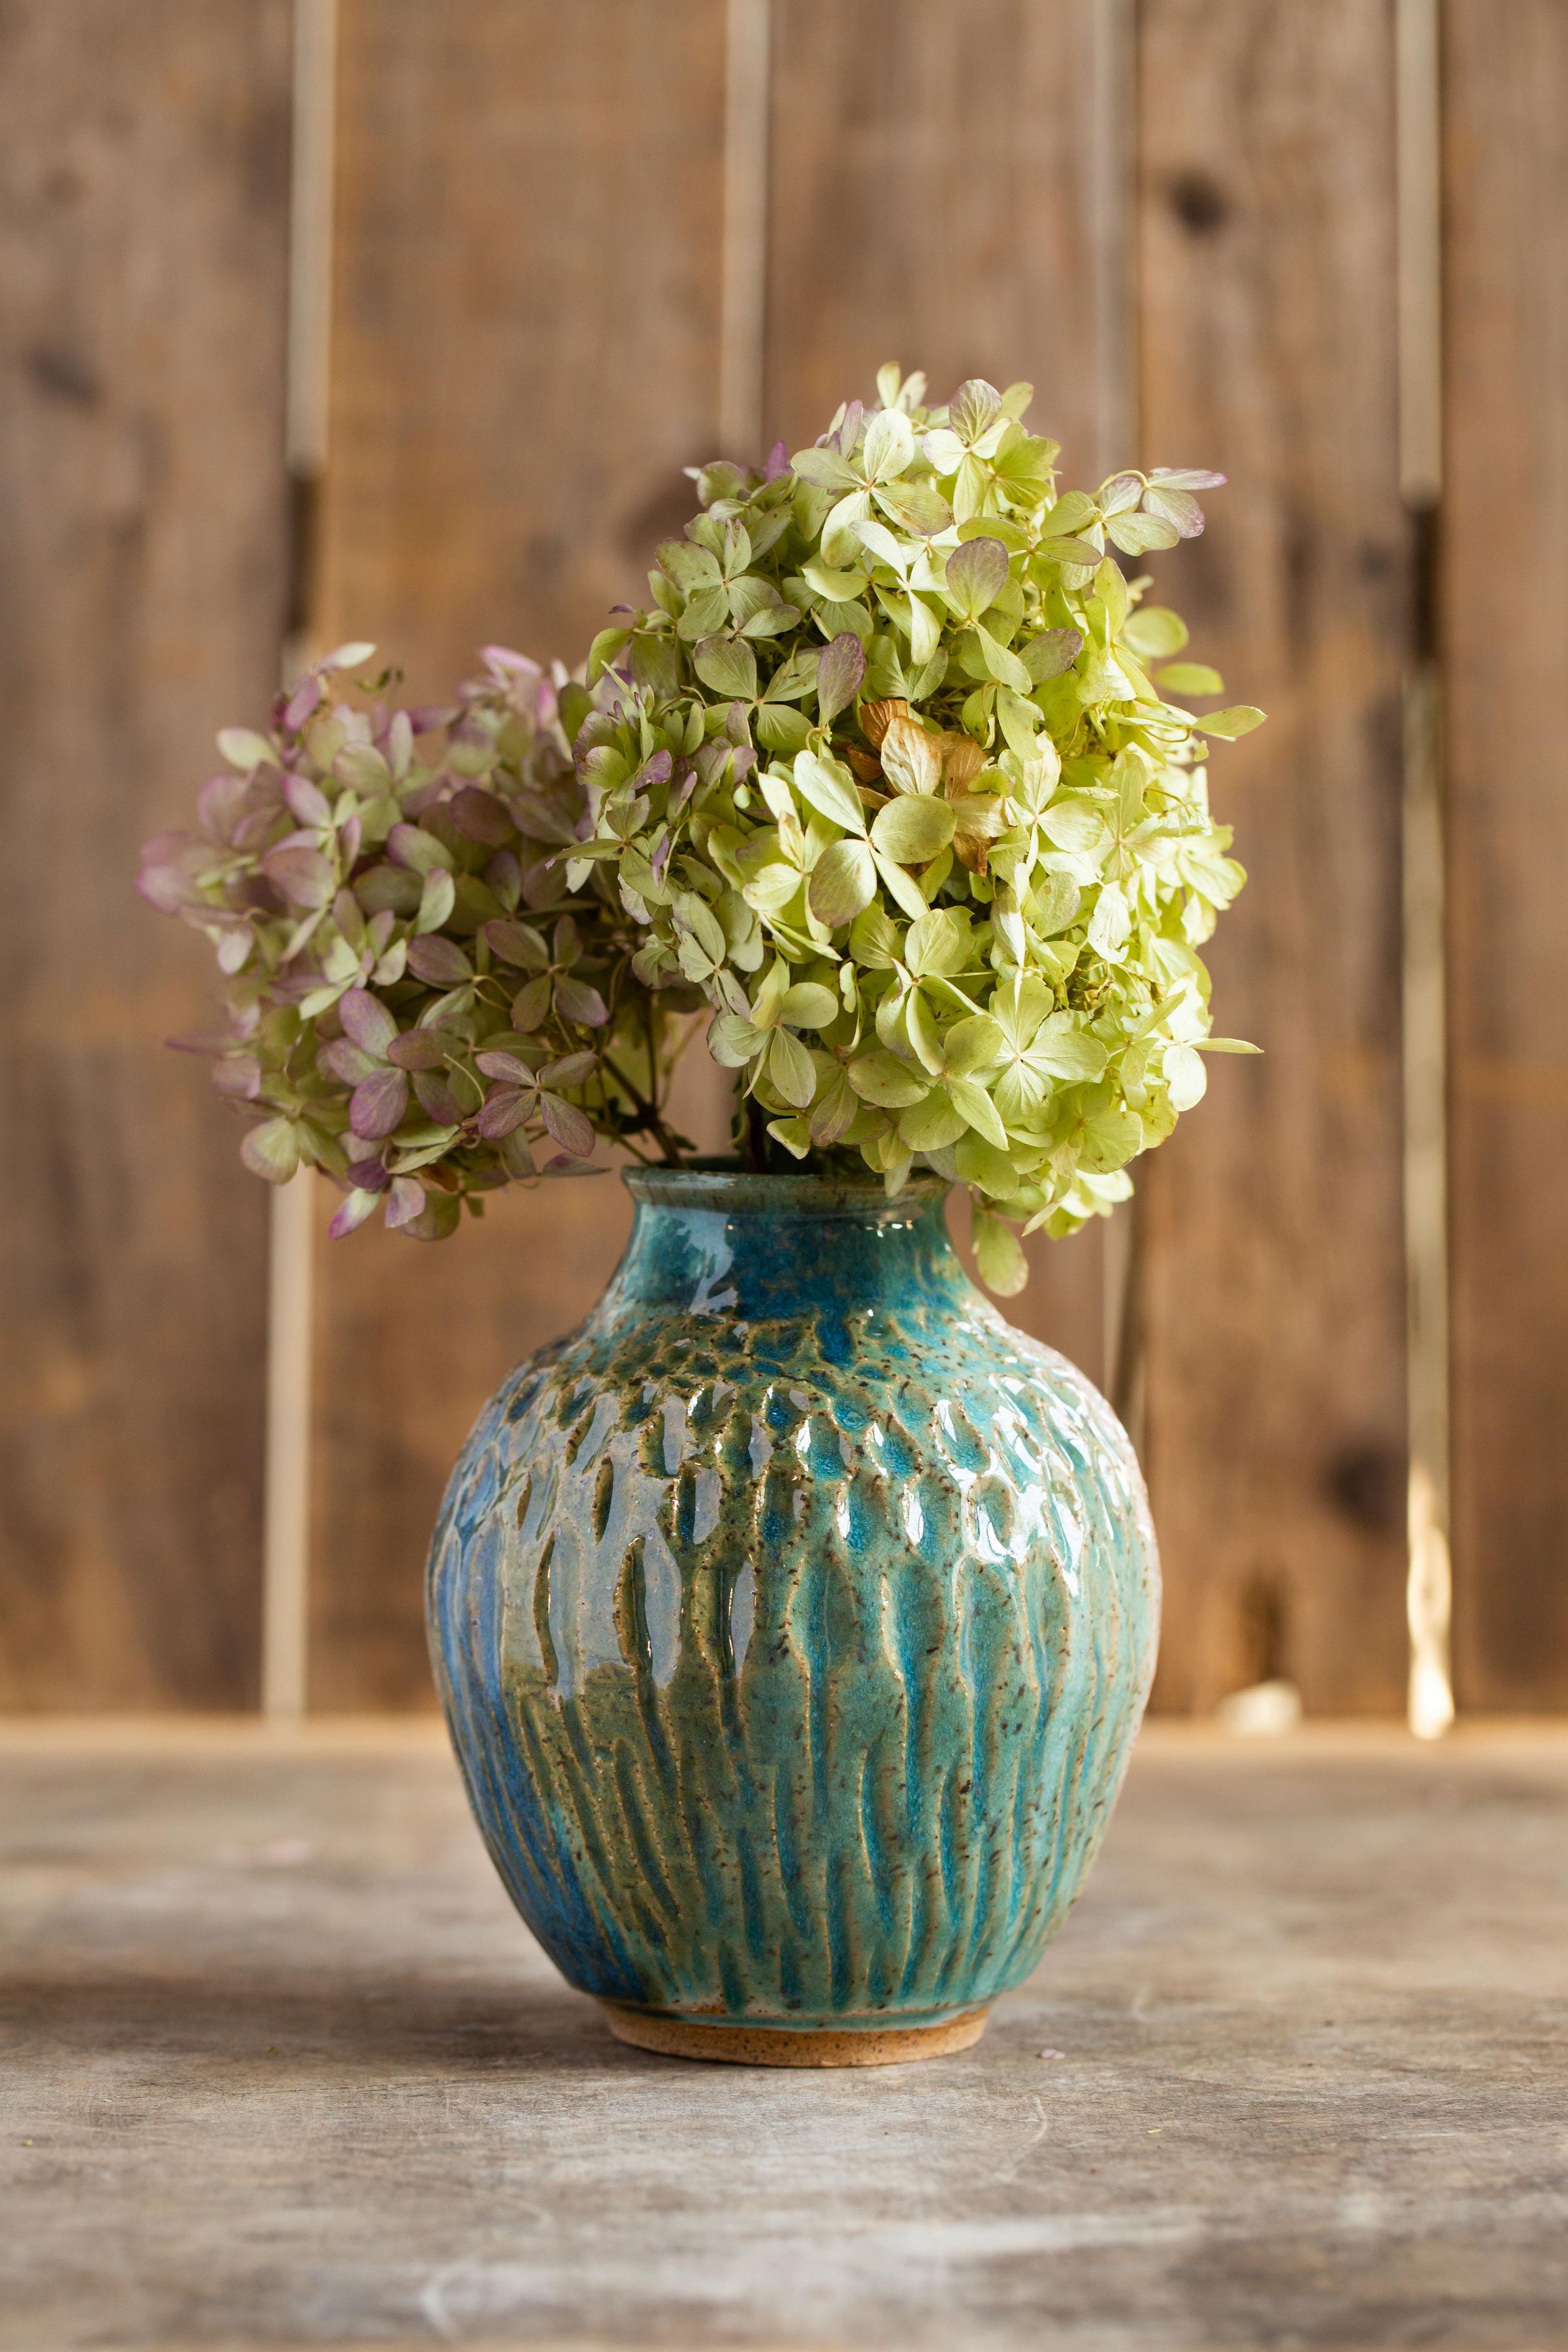 Lively, textured vase